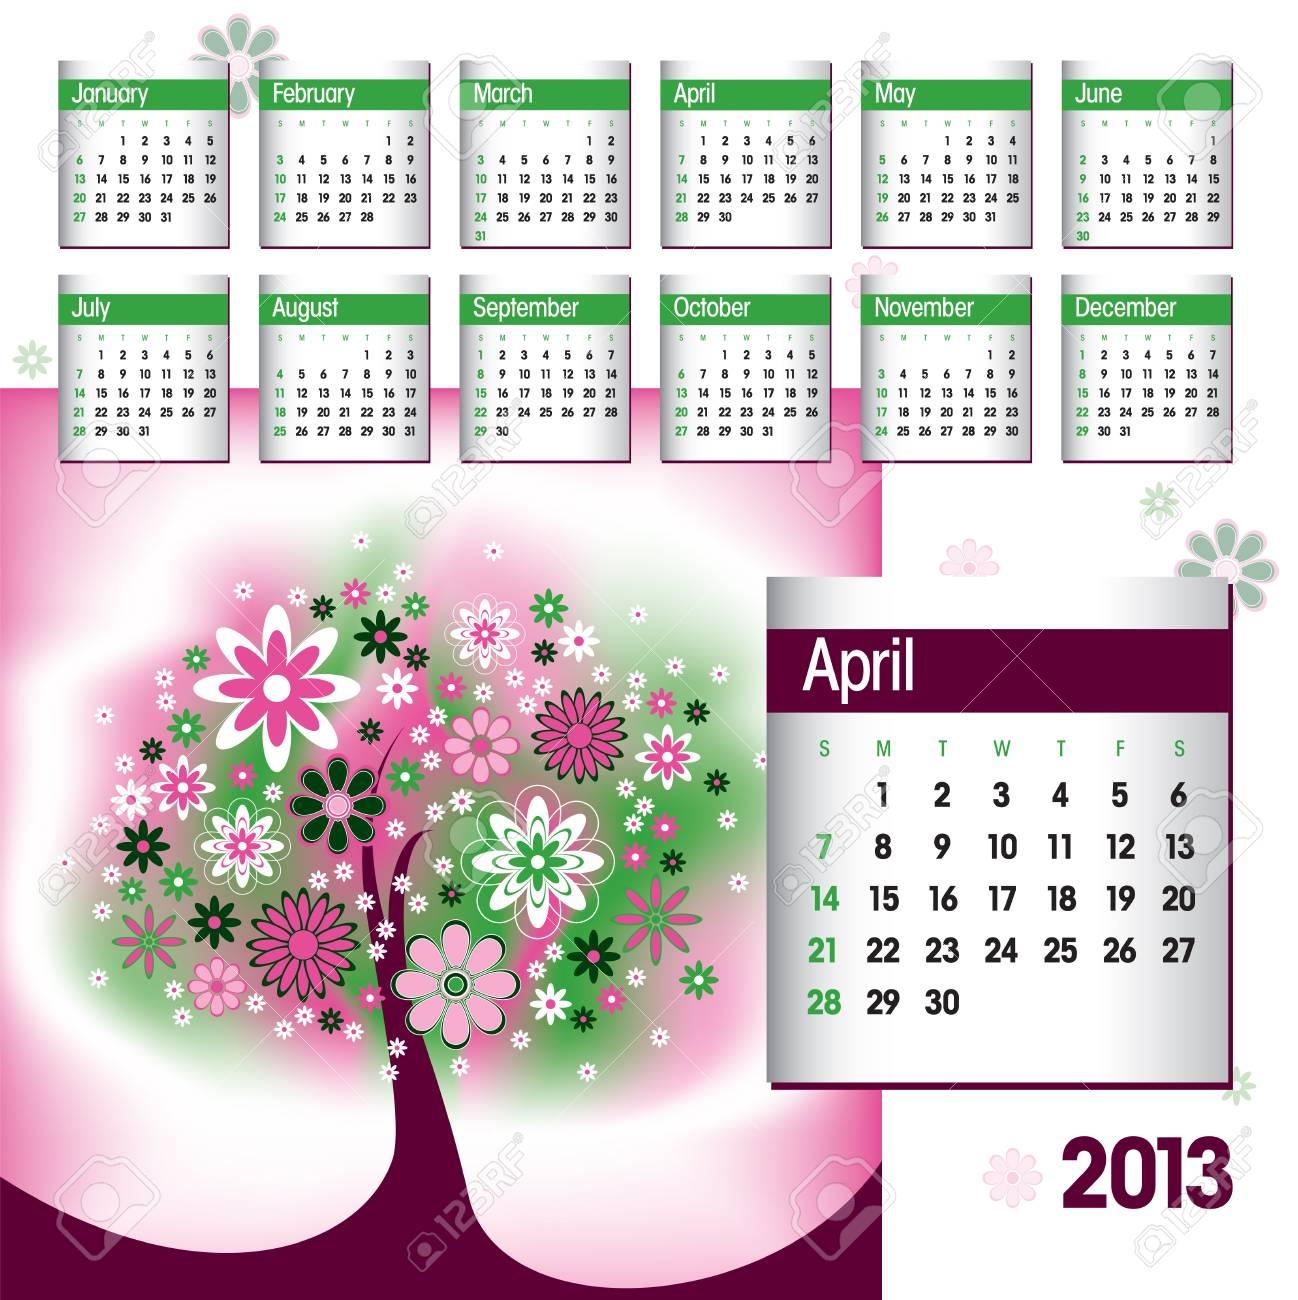 2013 Calendar  April Stock Vector - 14854127